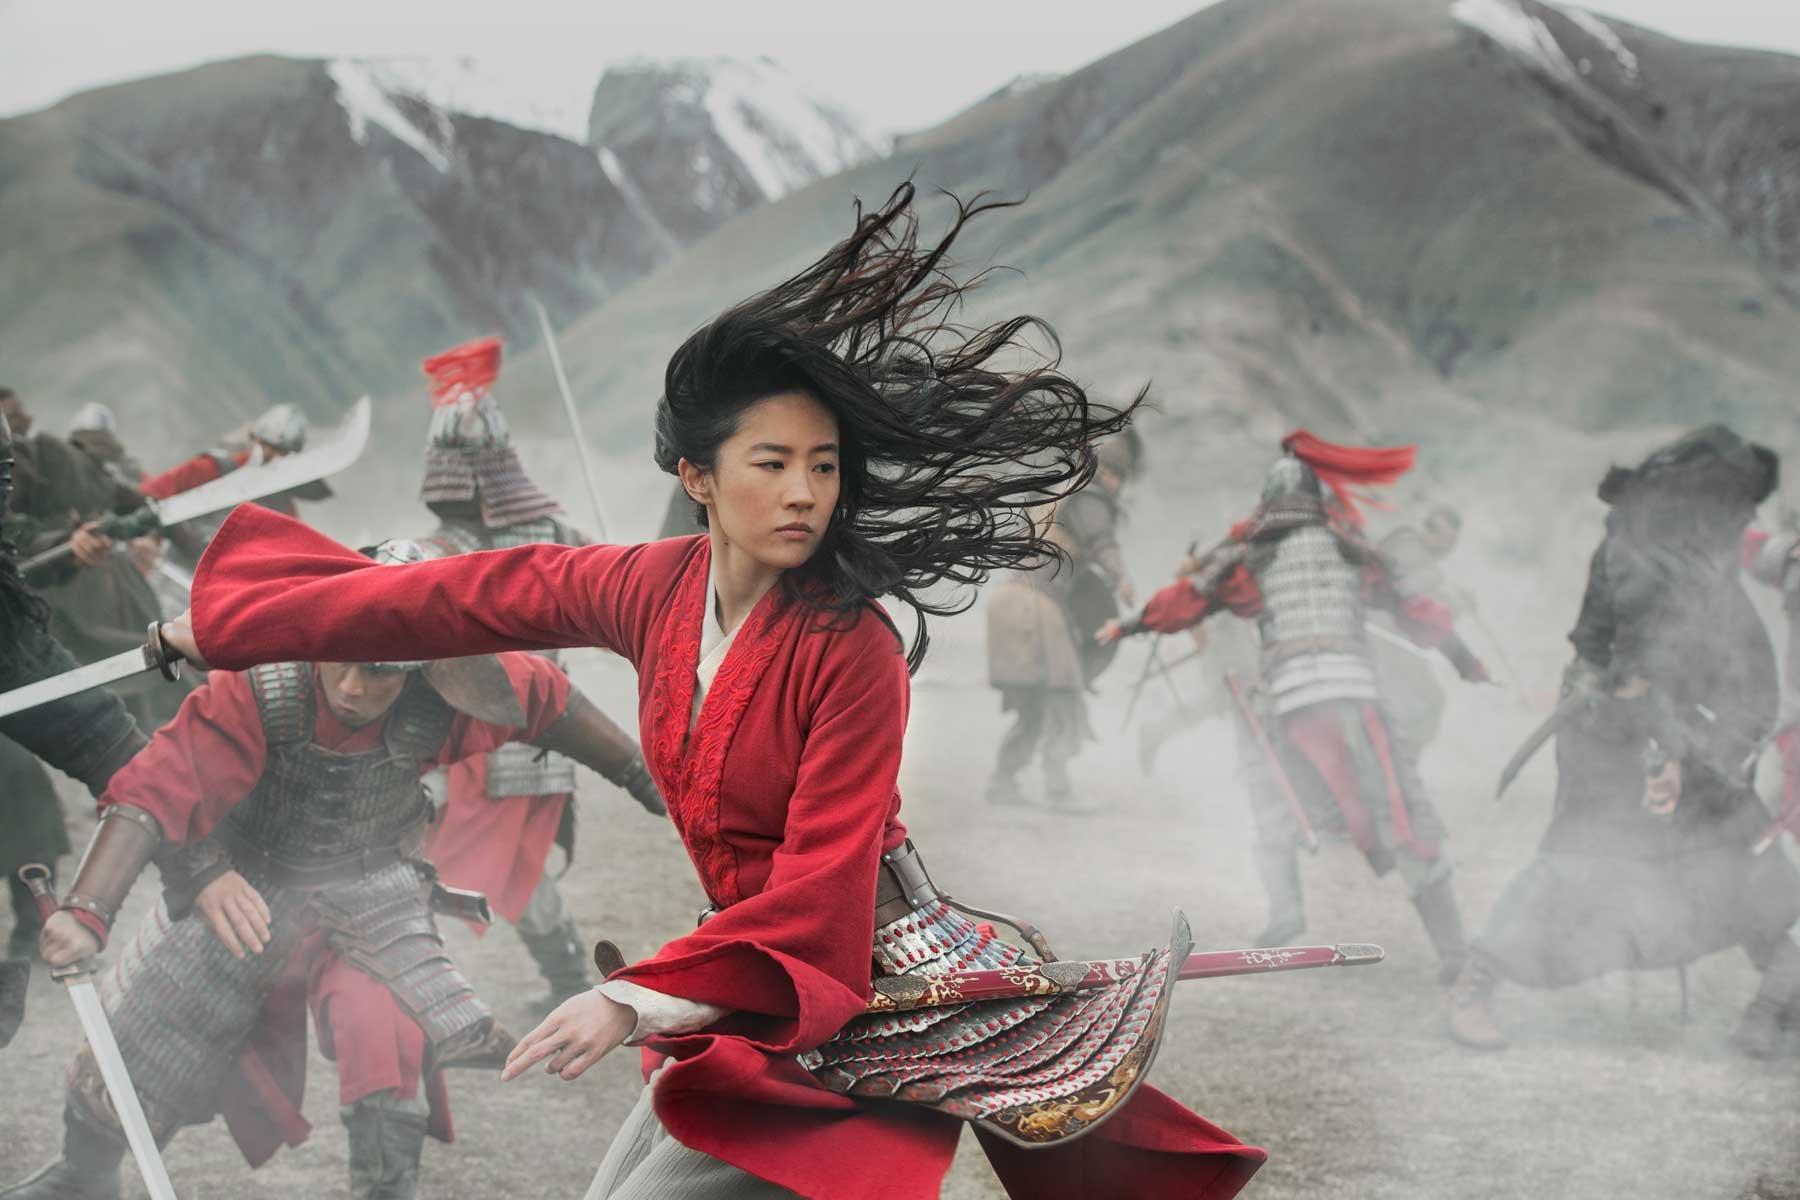 'Mulan' Reboot Will Premiere on Disney Plus in September for $30